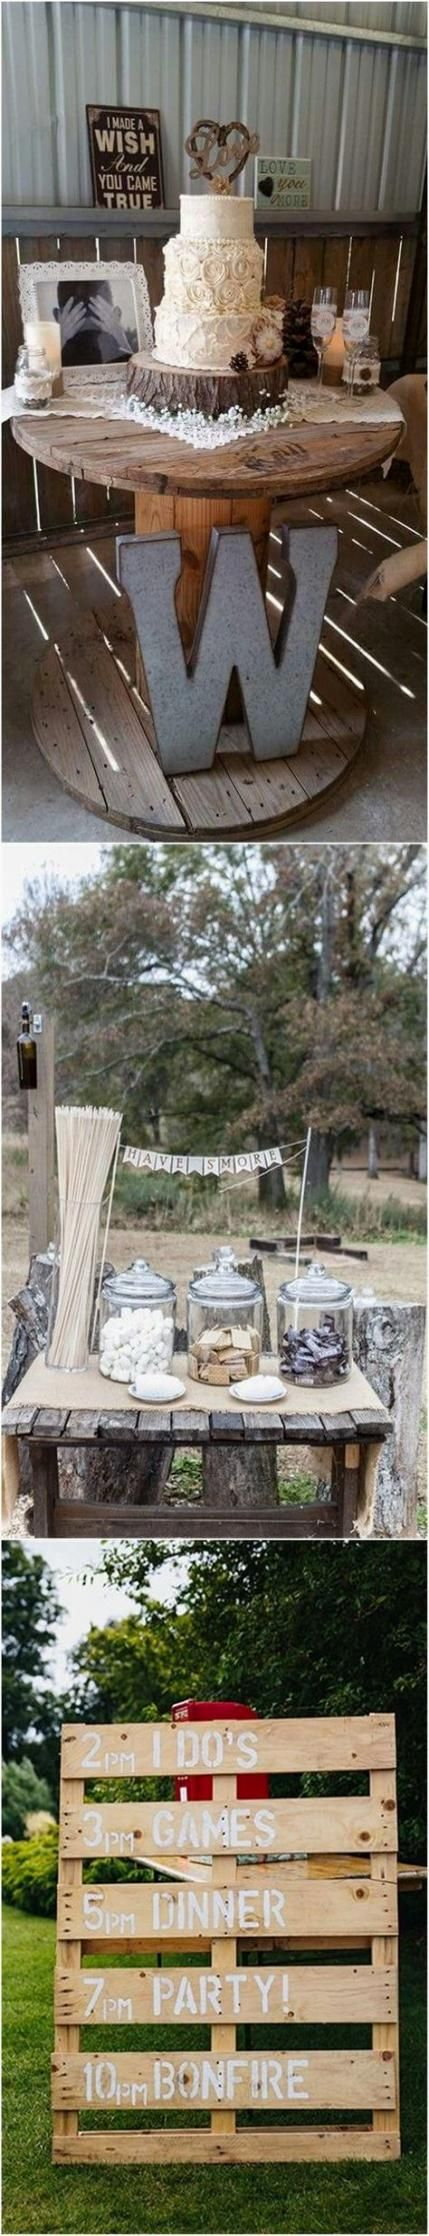 Top Rustic Backyard Wedding On A Budget Receptions Ideas ...